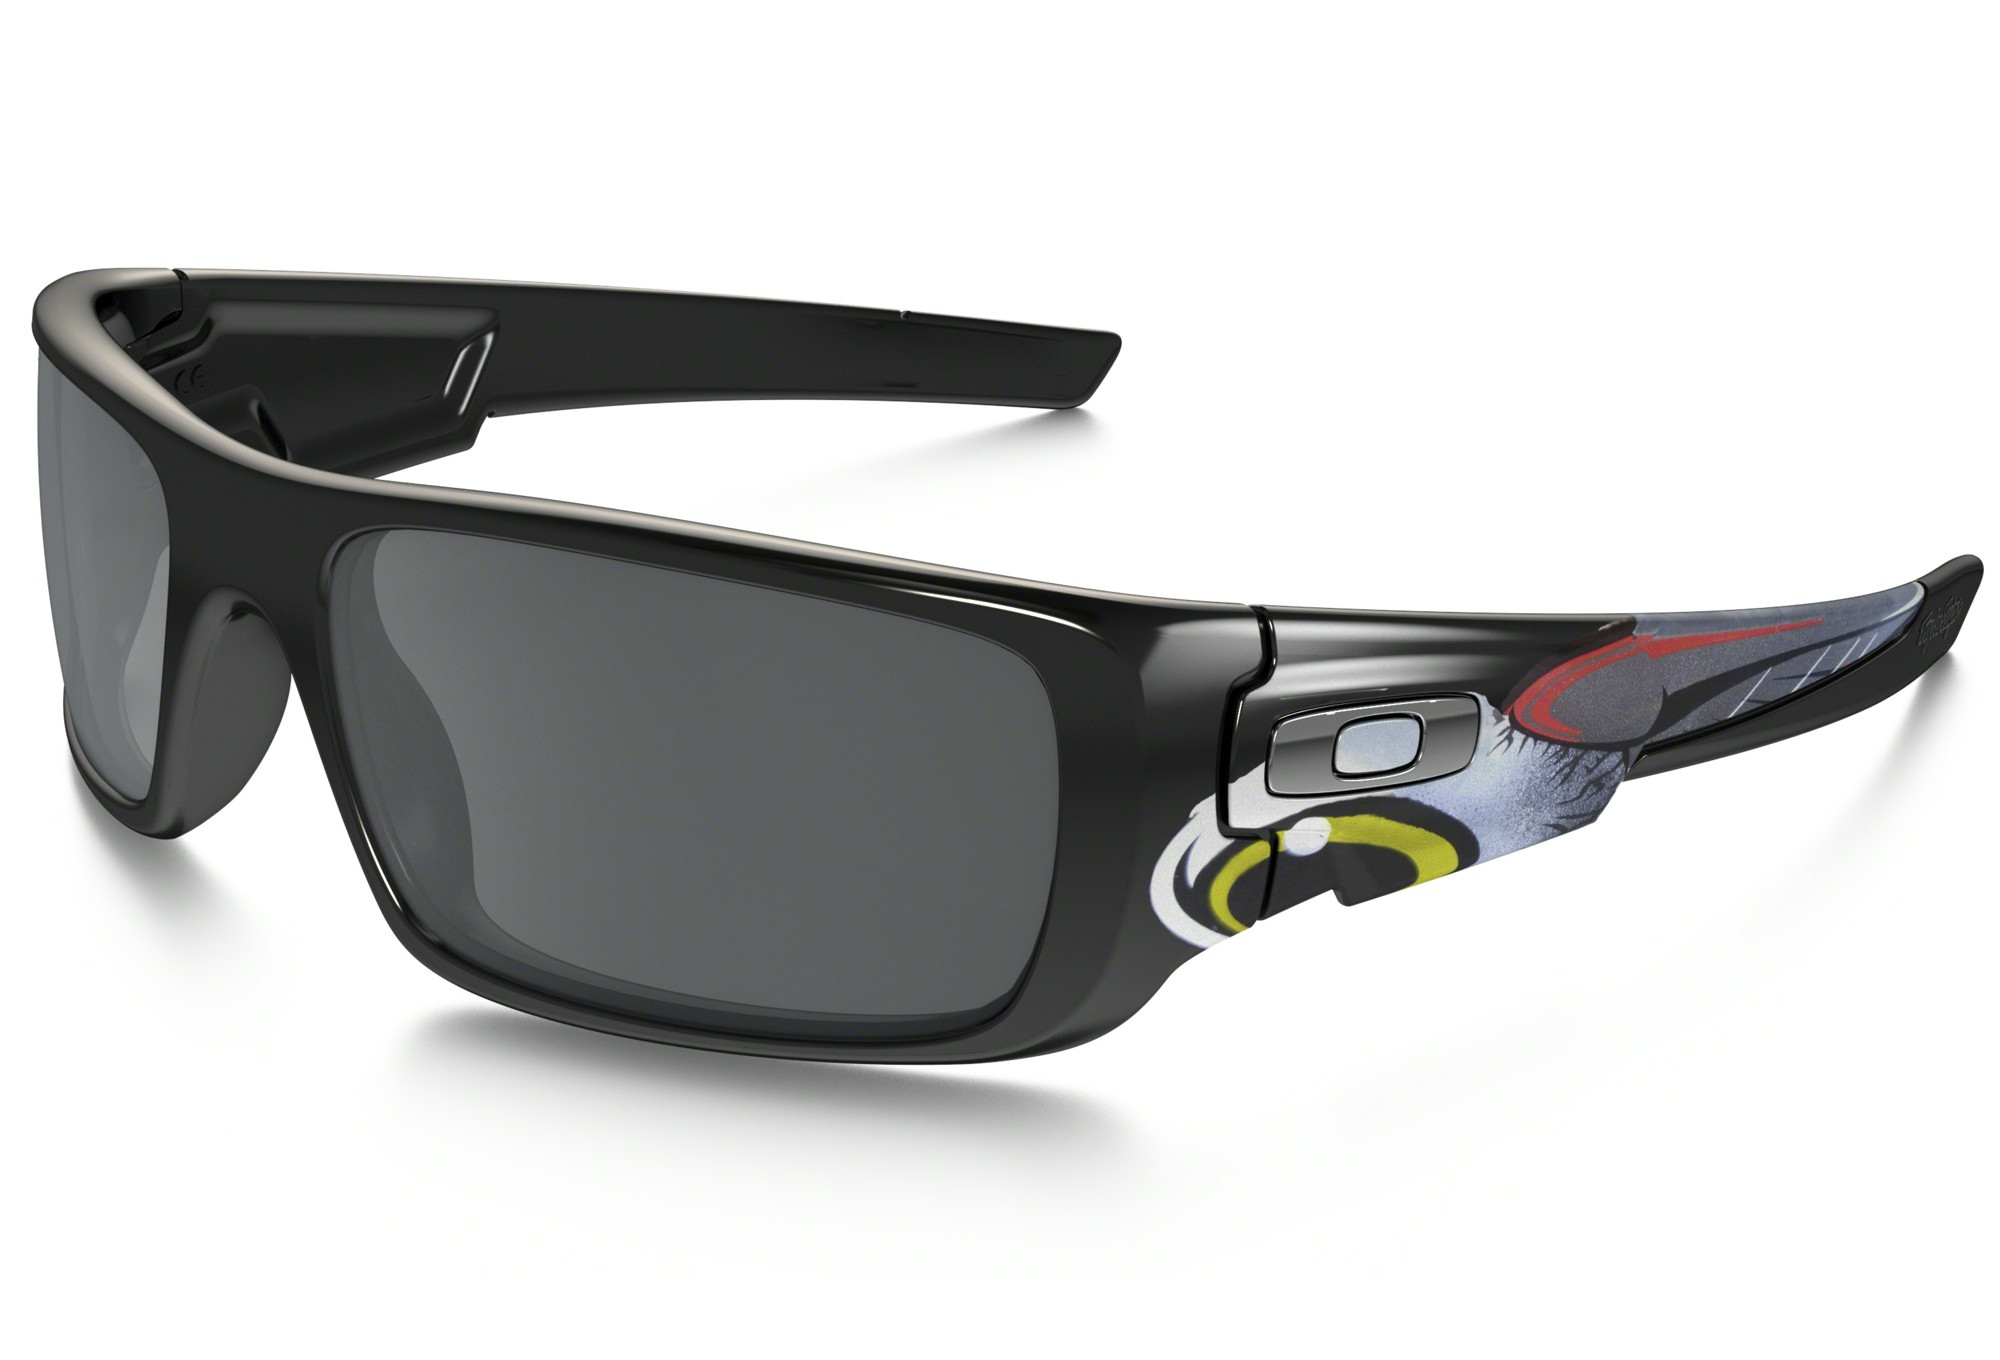 OAKLEY CRANKSHAFT TROY LEE DESIGNS Sunglasses Black - Black Iridium Ref  OO9239-18 67932b7012